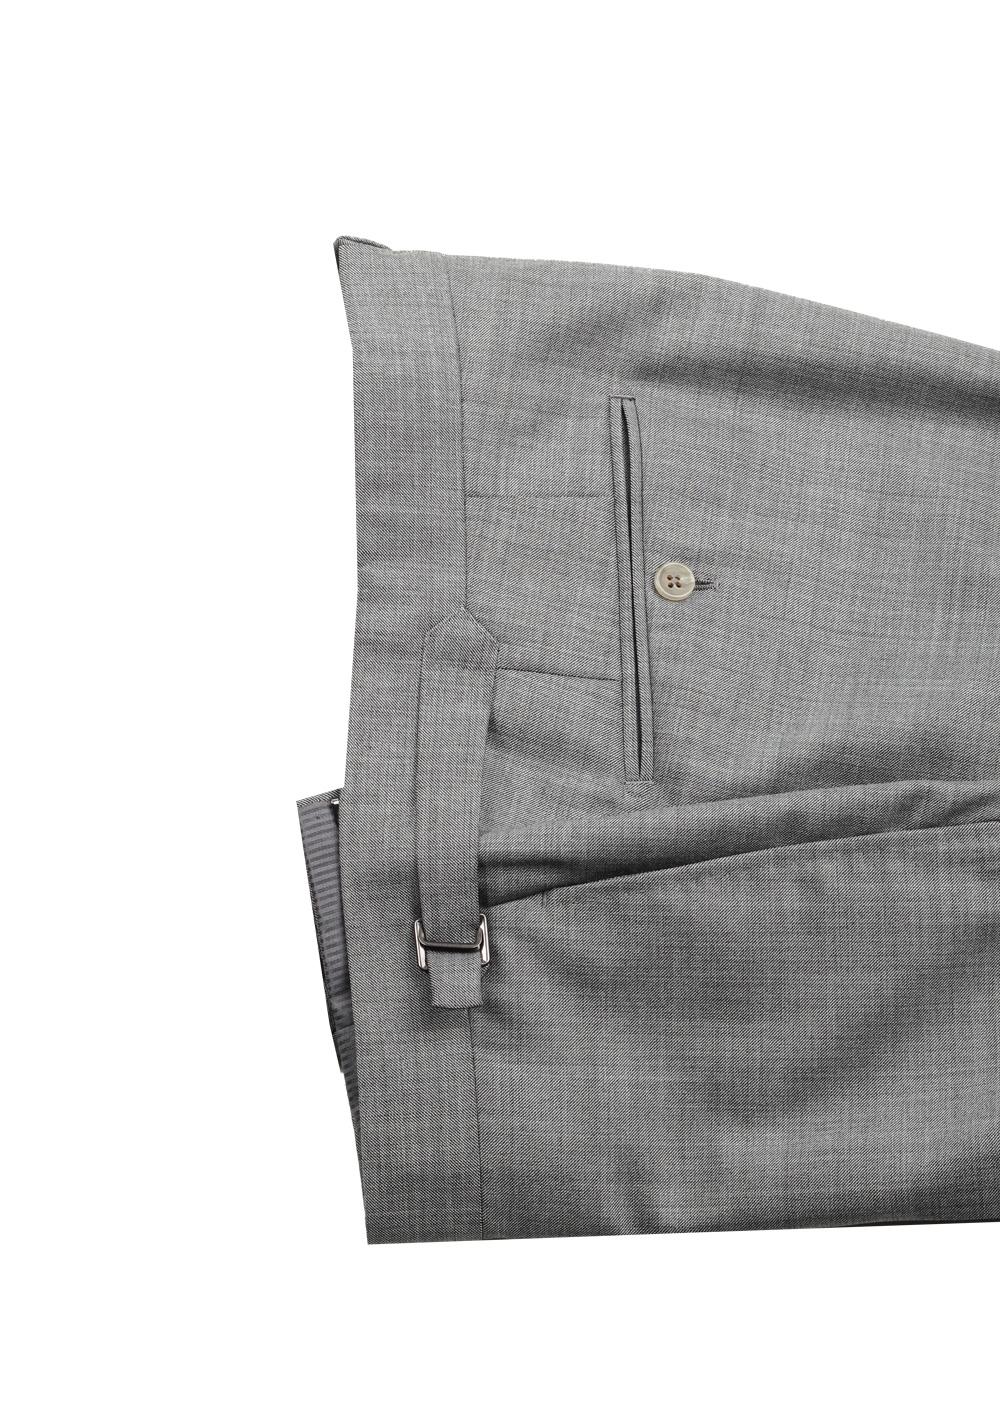 TOM FORD Shelton Solid Gray Suit   Costume Limité